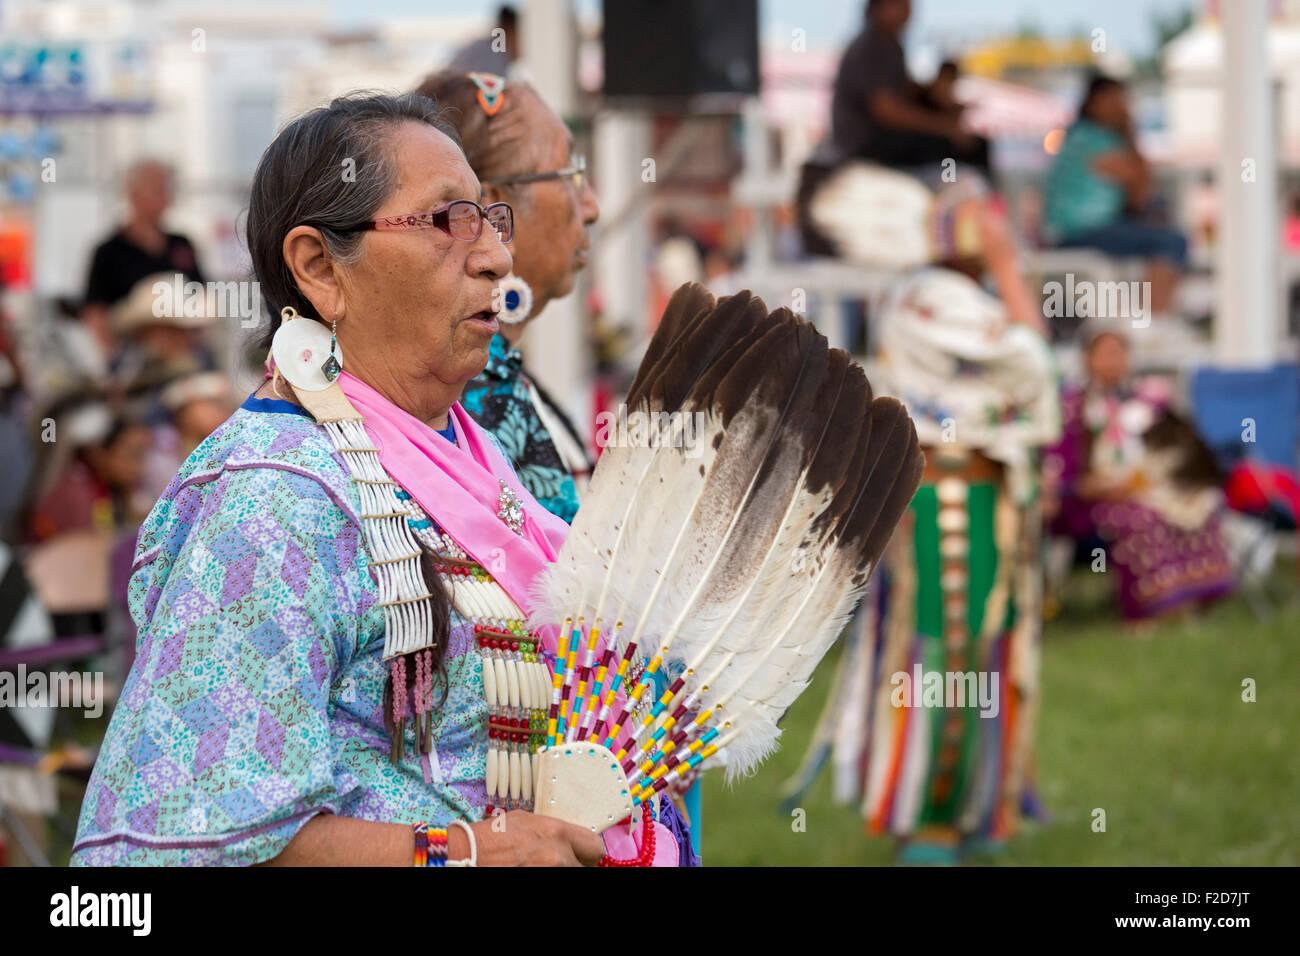 Rosebud Indian Reservation, South Dakota - The Rosebud Sioux Tribe's annual wacipi (powwow). - Stock Image